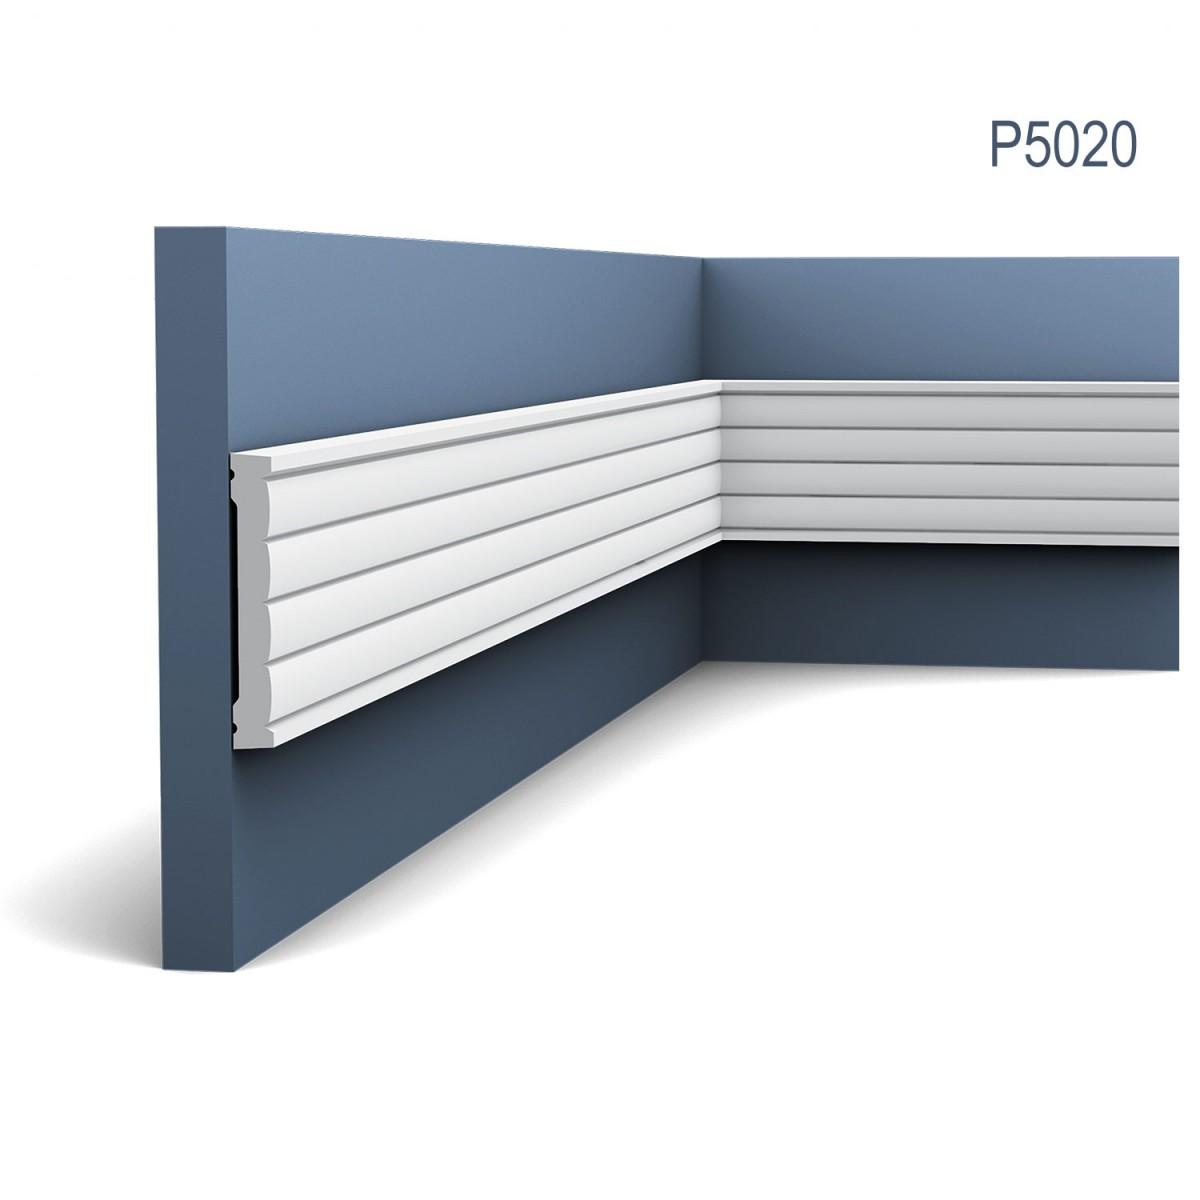 Brau Luxxus P5020, Dimensiuni: 200 X 9.1 X 1.3 cm, Orac Decor